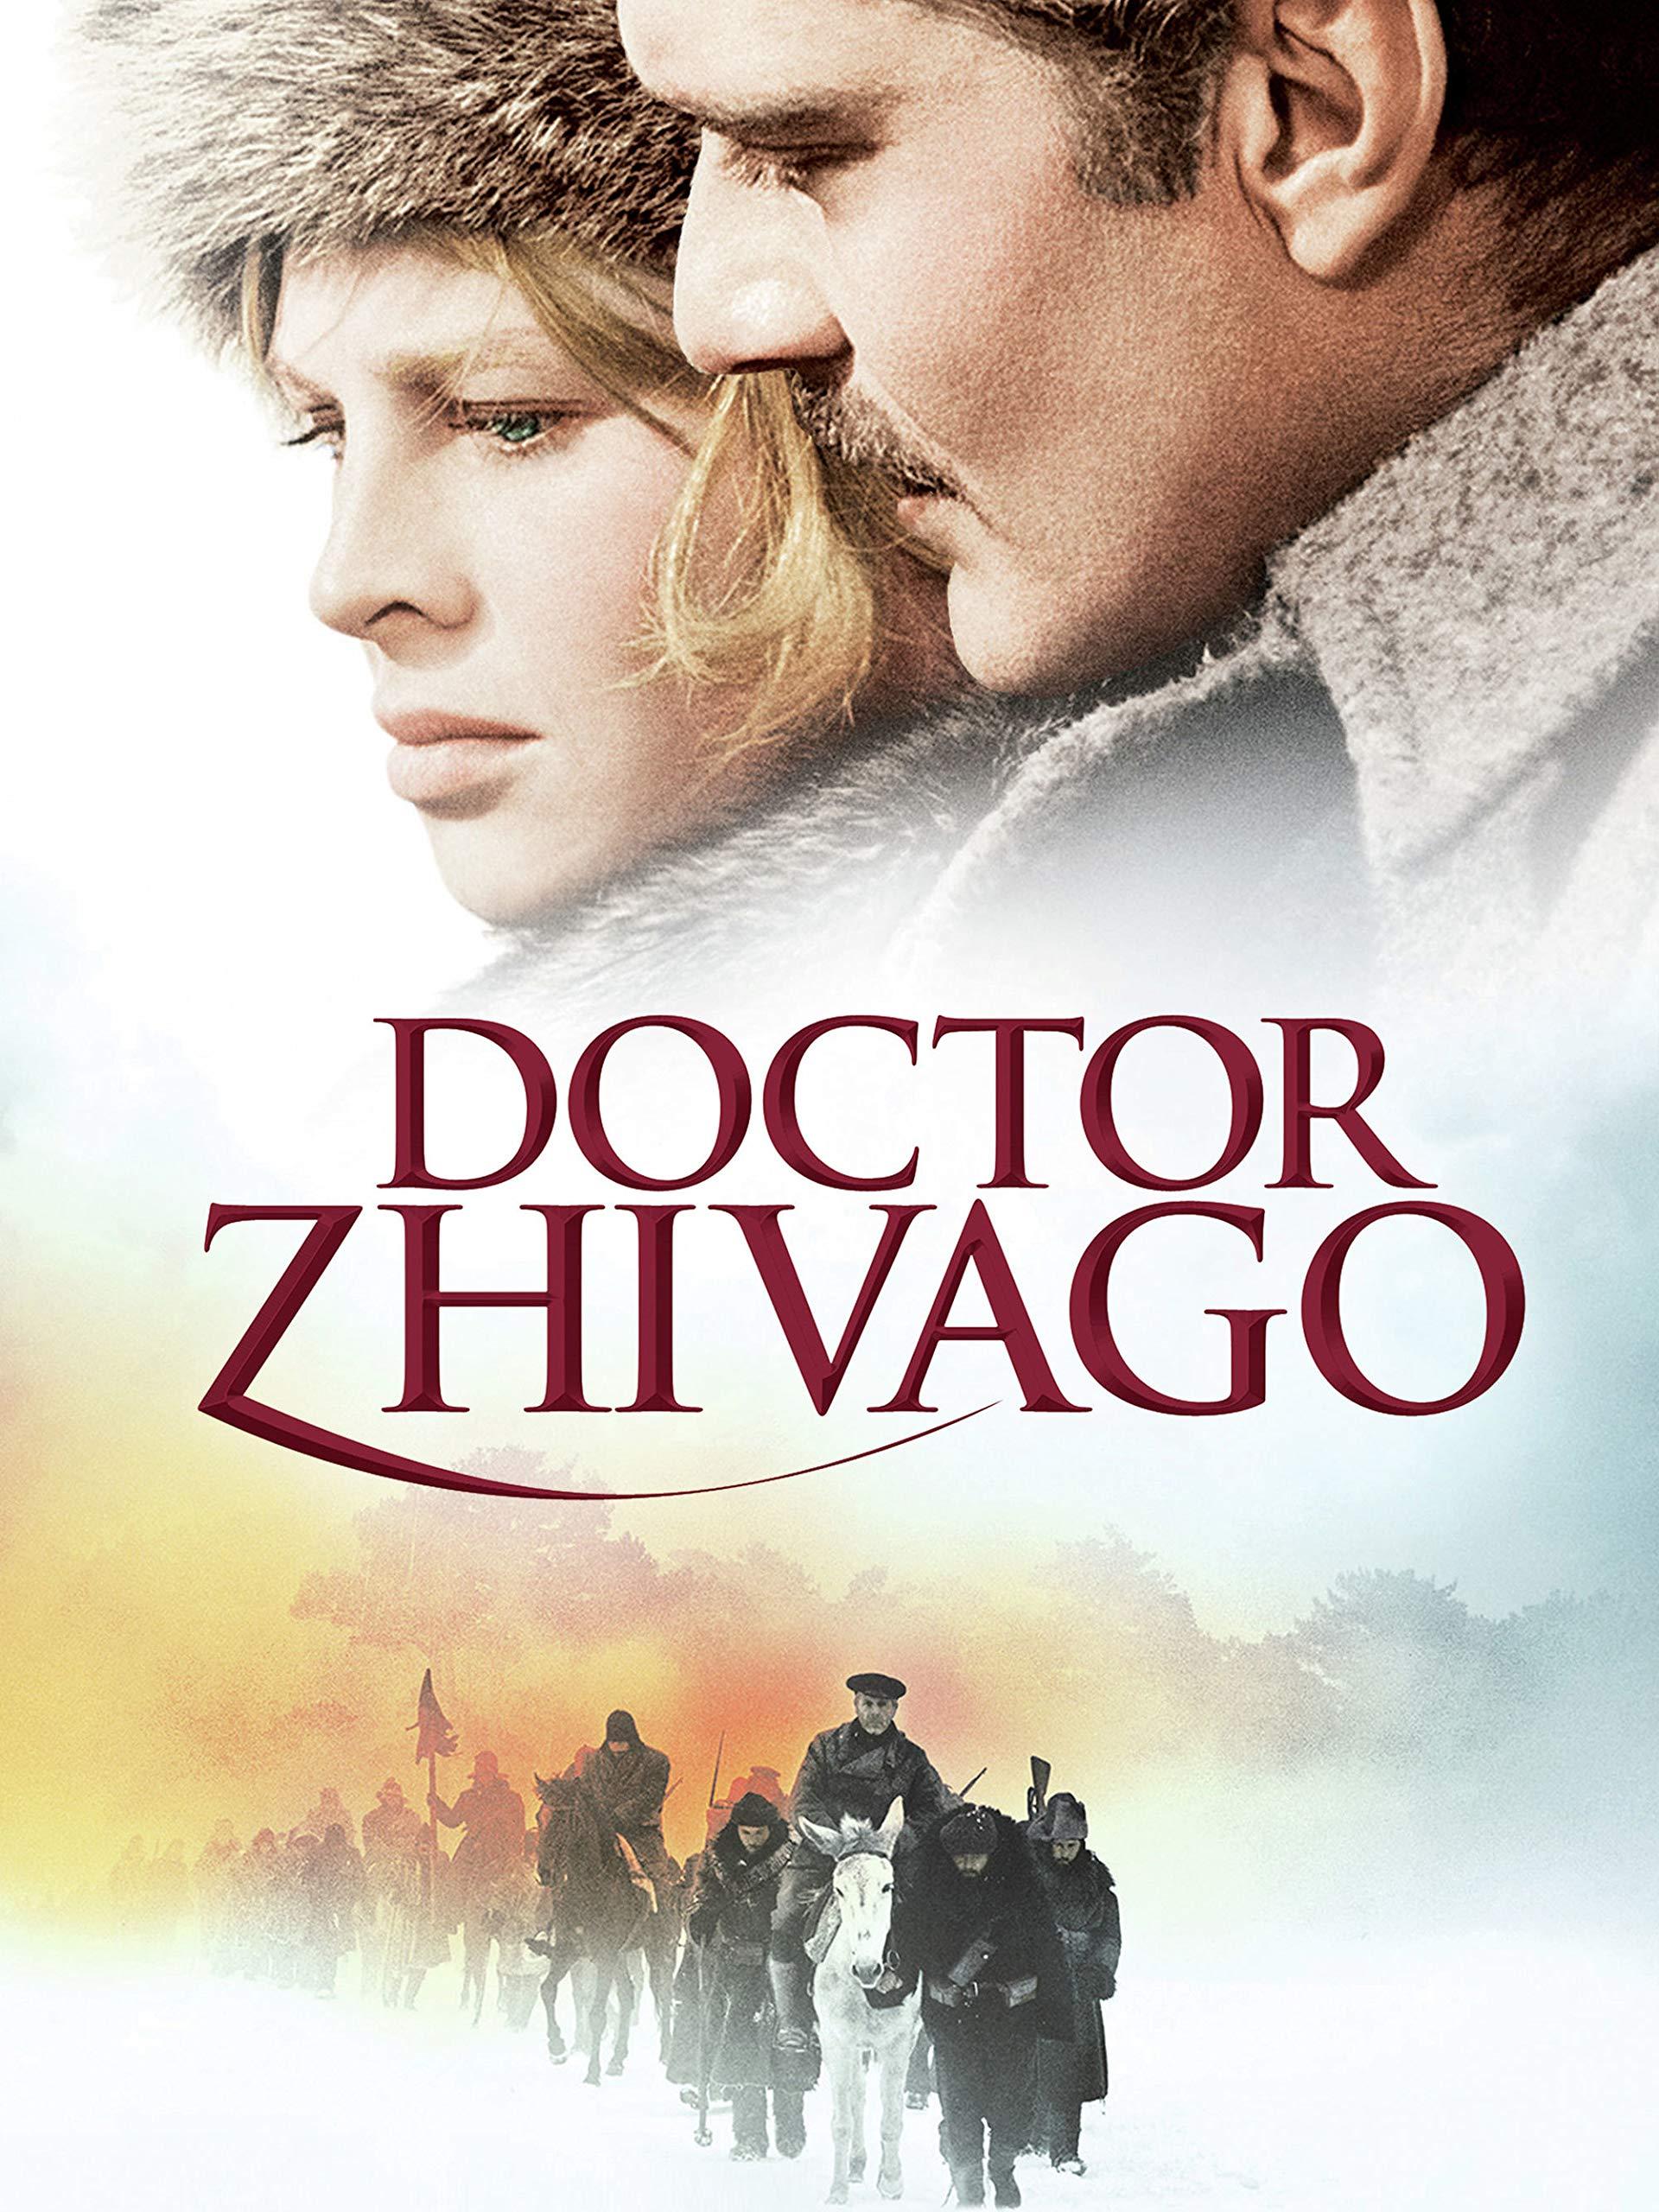 Watch Doctor Zhivago Prime Video